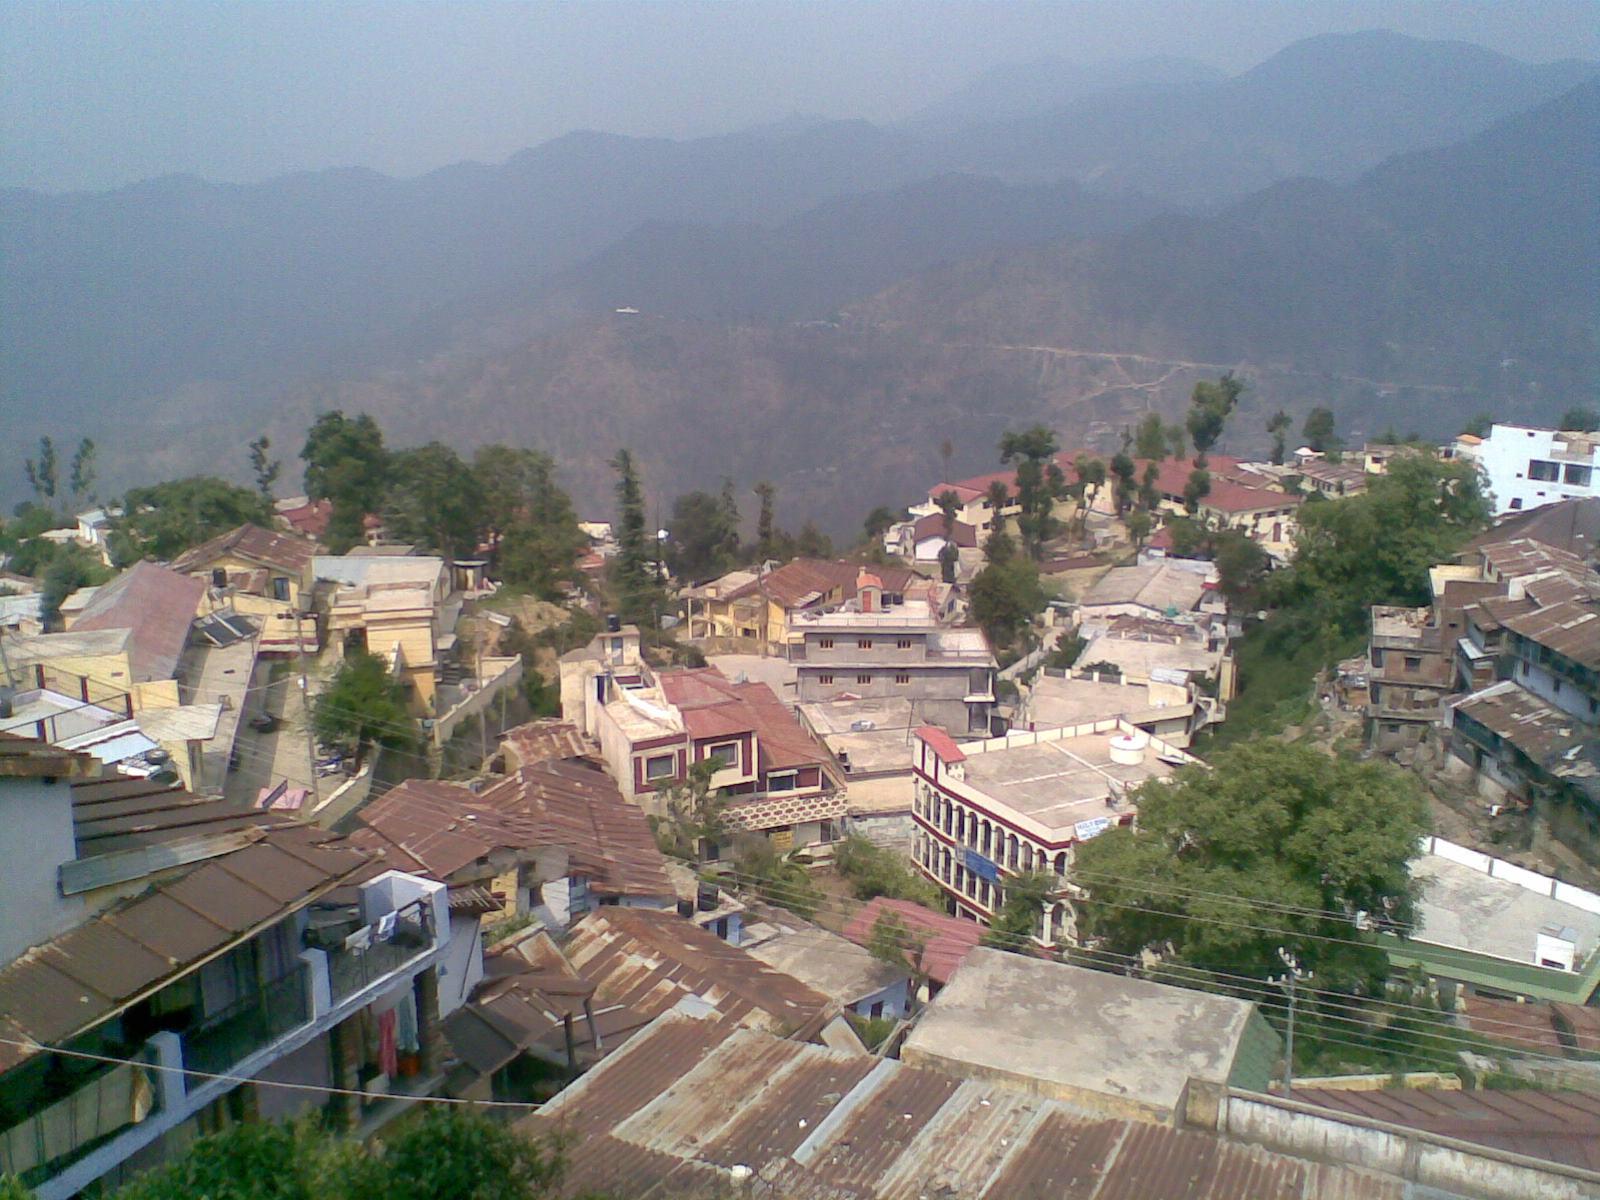 Pauri Garhwal India  city pictures gallery : Home District Pauri Garhwal Uttarakhand India | Tattoo Design Bild